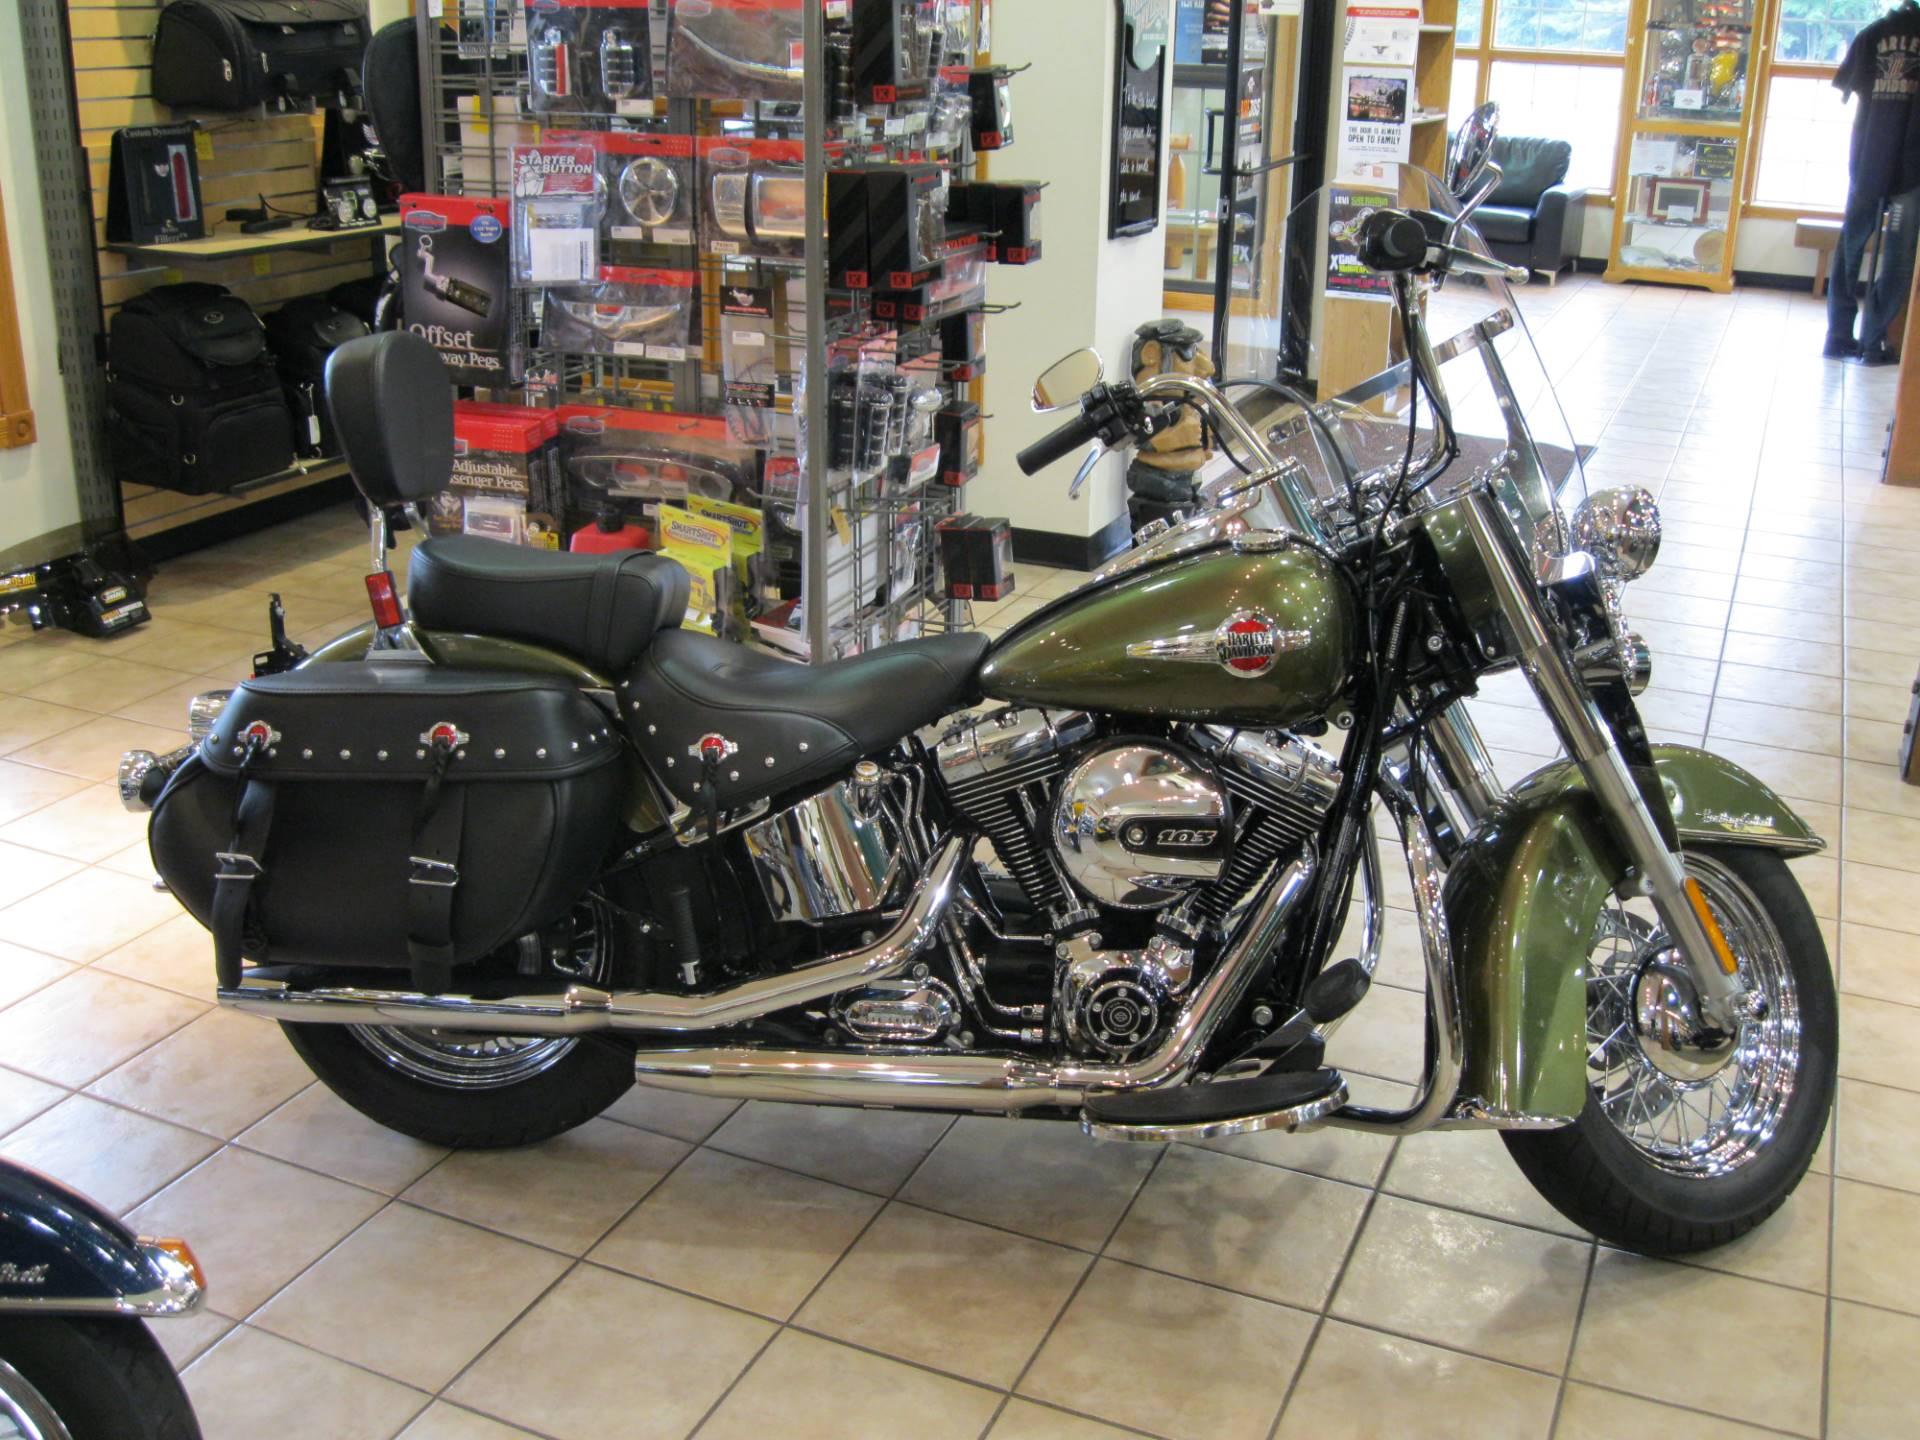 Harley Davidson Dealers In Wisconsin Map.2016 Harley Davidson Flstc Motorcycles Black River Falls Wisconsin 4364